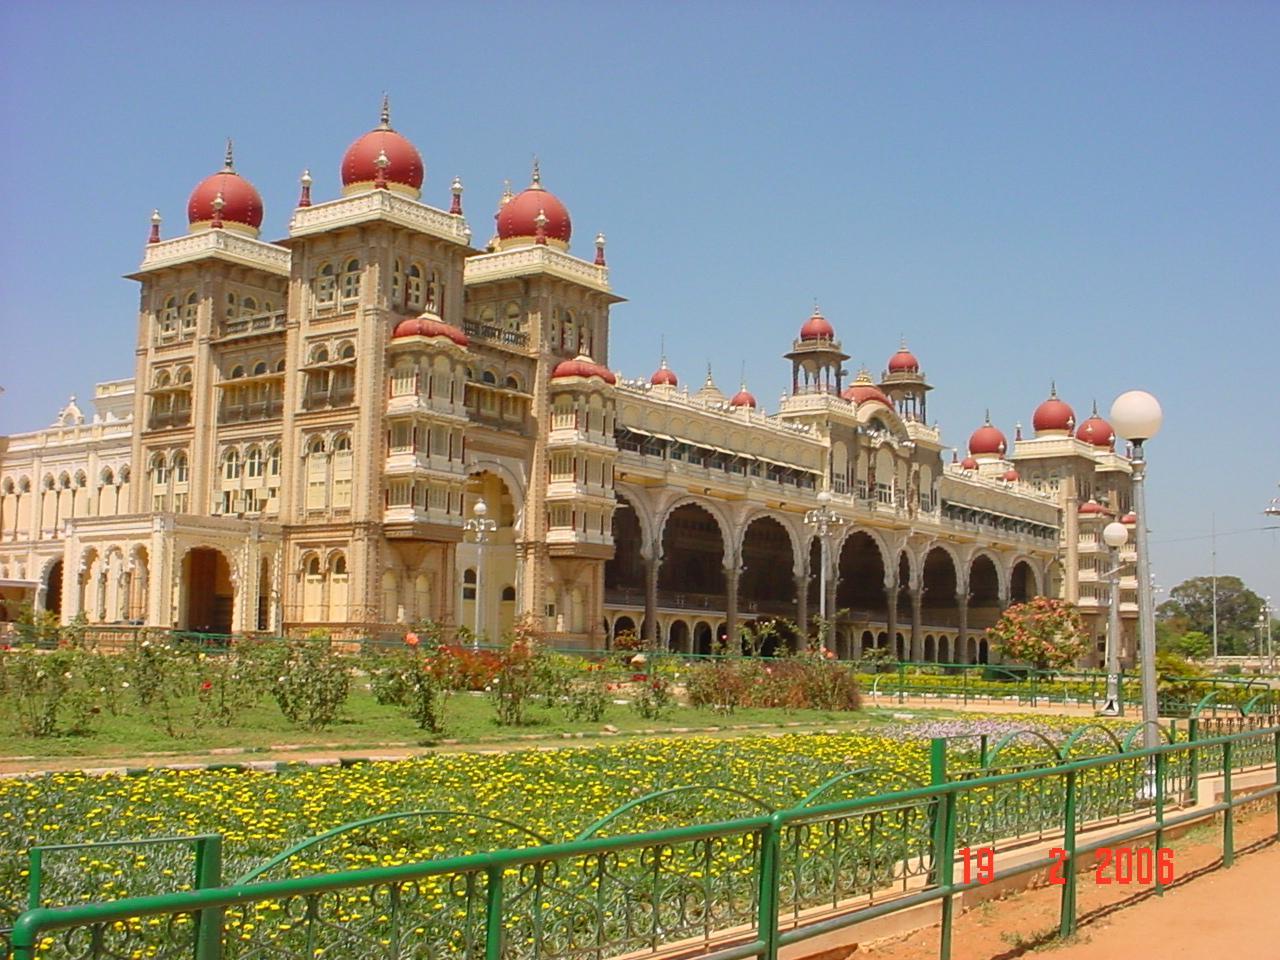 http://www.prasannaholidays.com/wp-content/uploads/2015/03/Amazing-Mysore-Maharaja-Palace-Photos.jpg